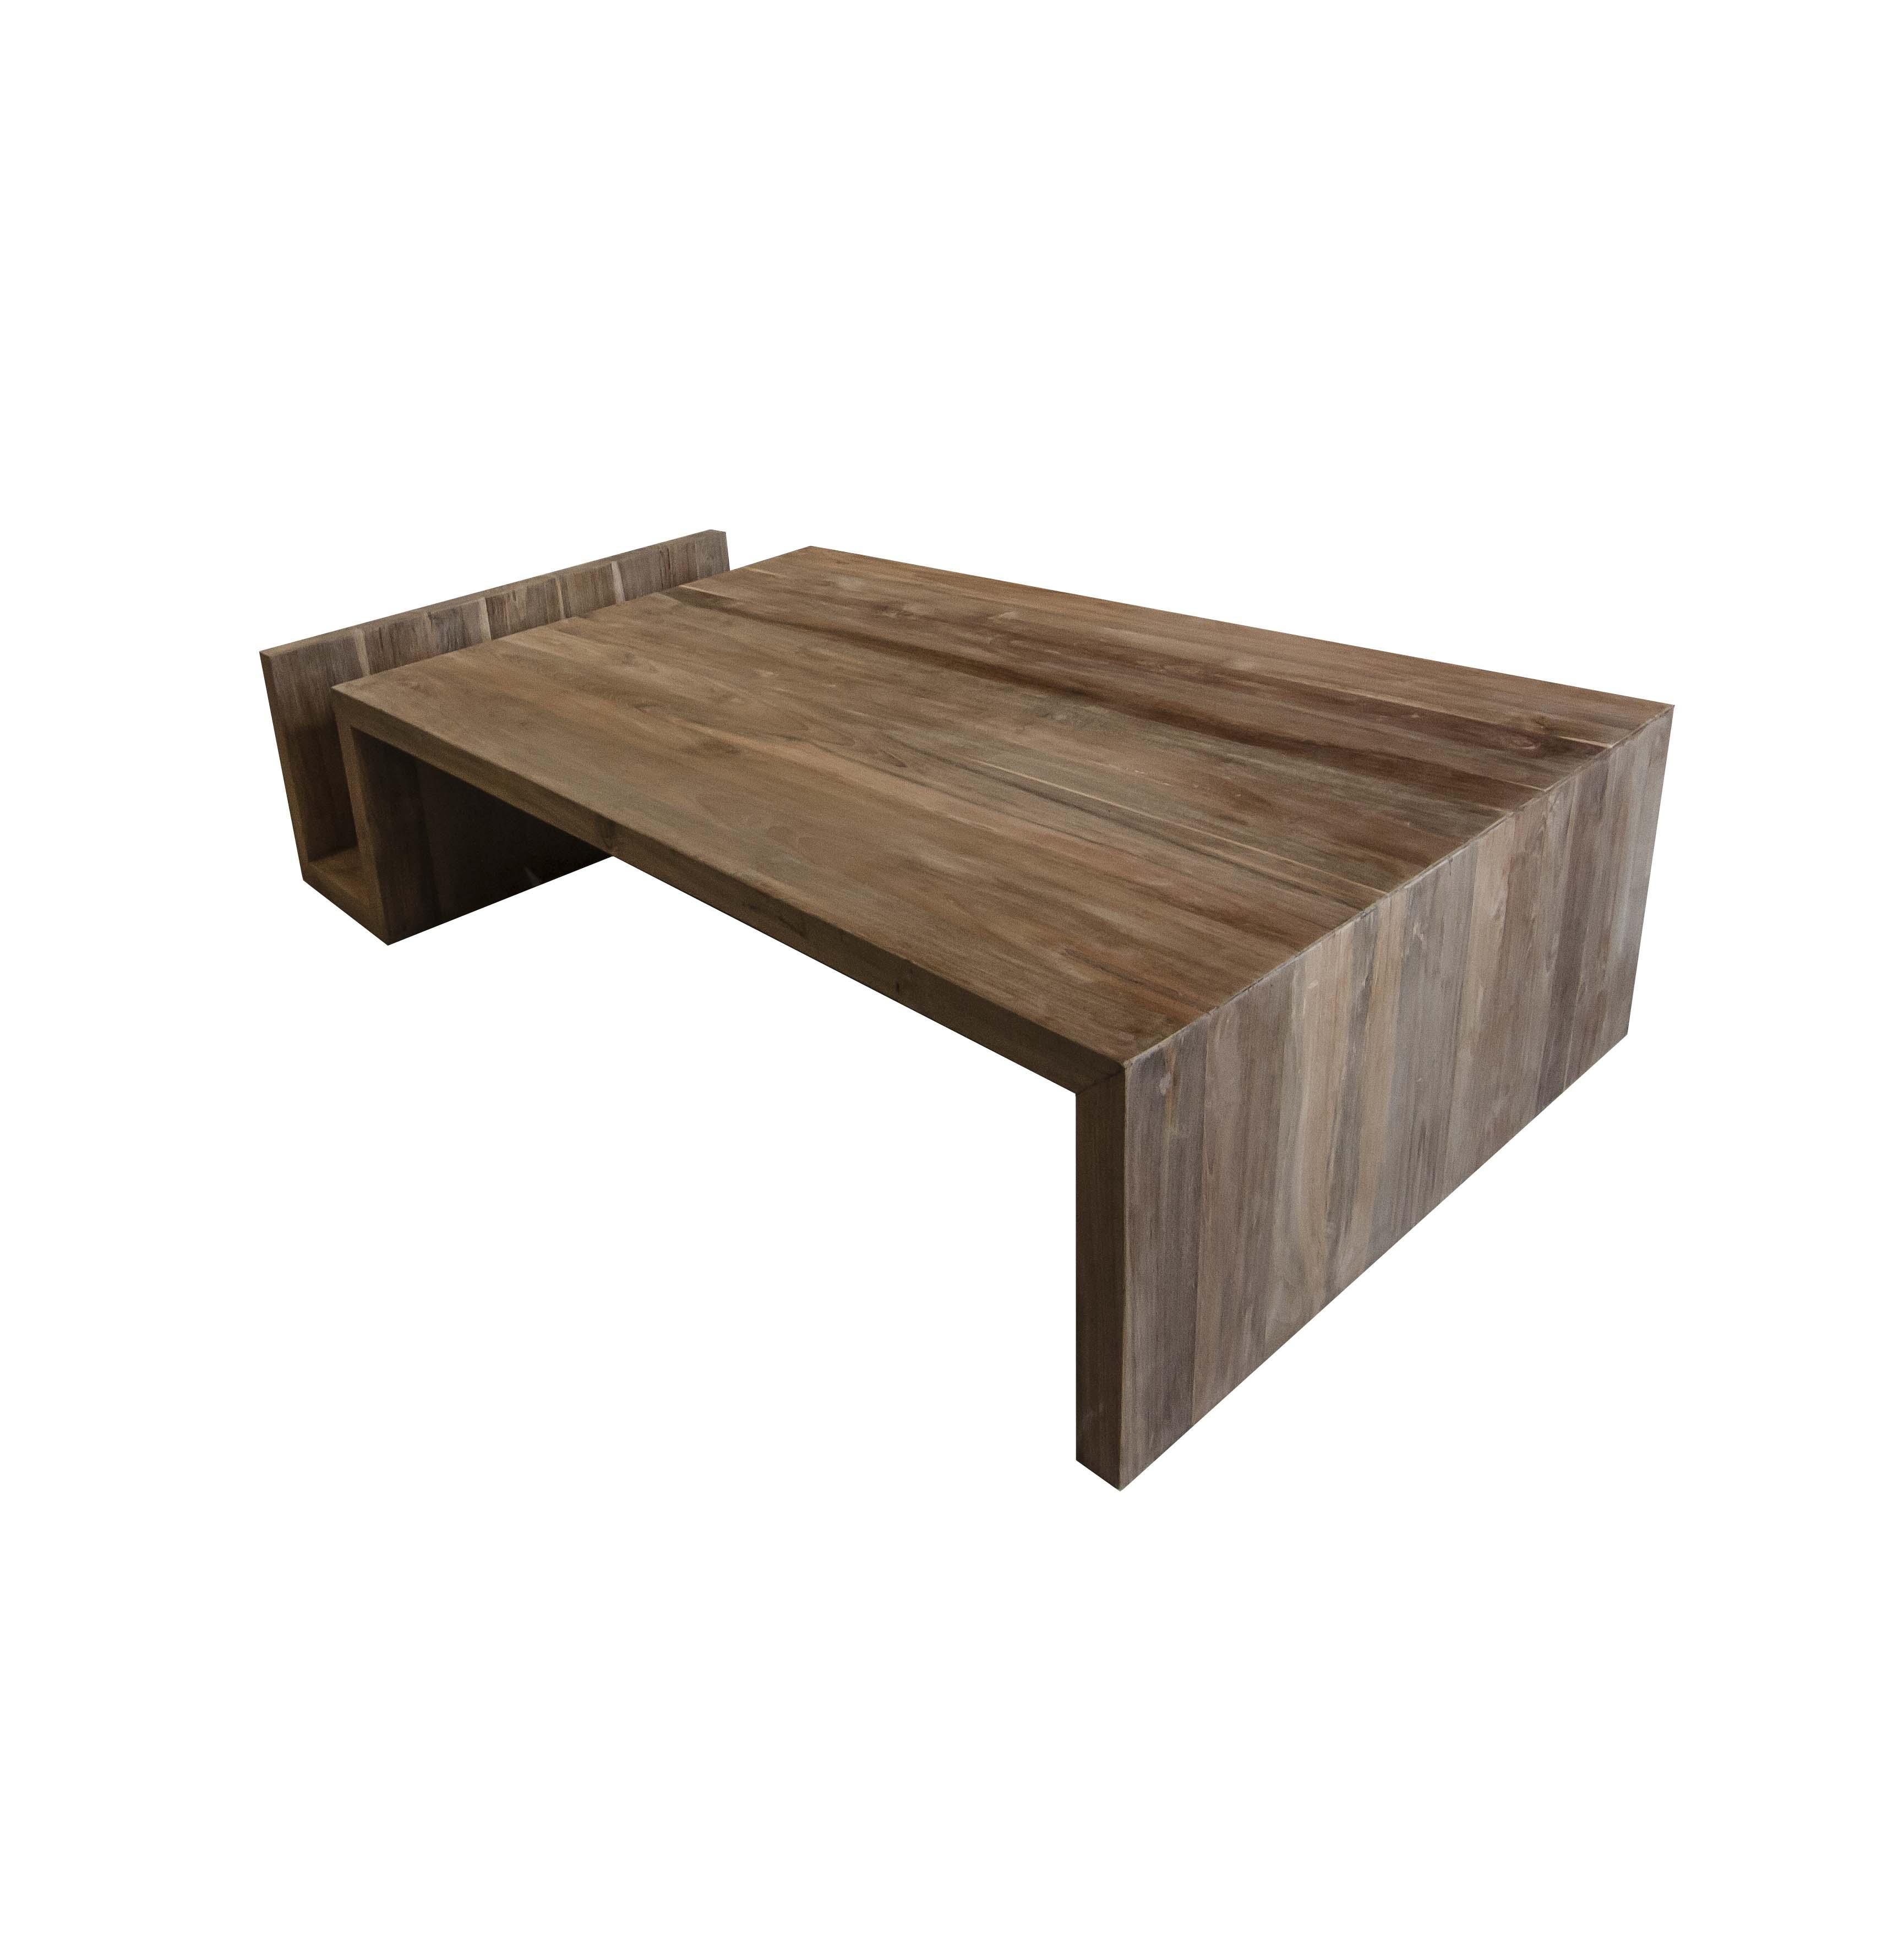 Kutamara Reclaimed Wood Coffee Table2